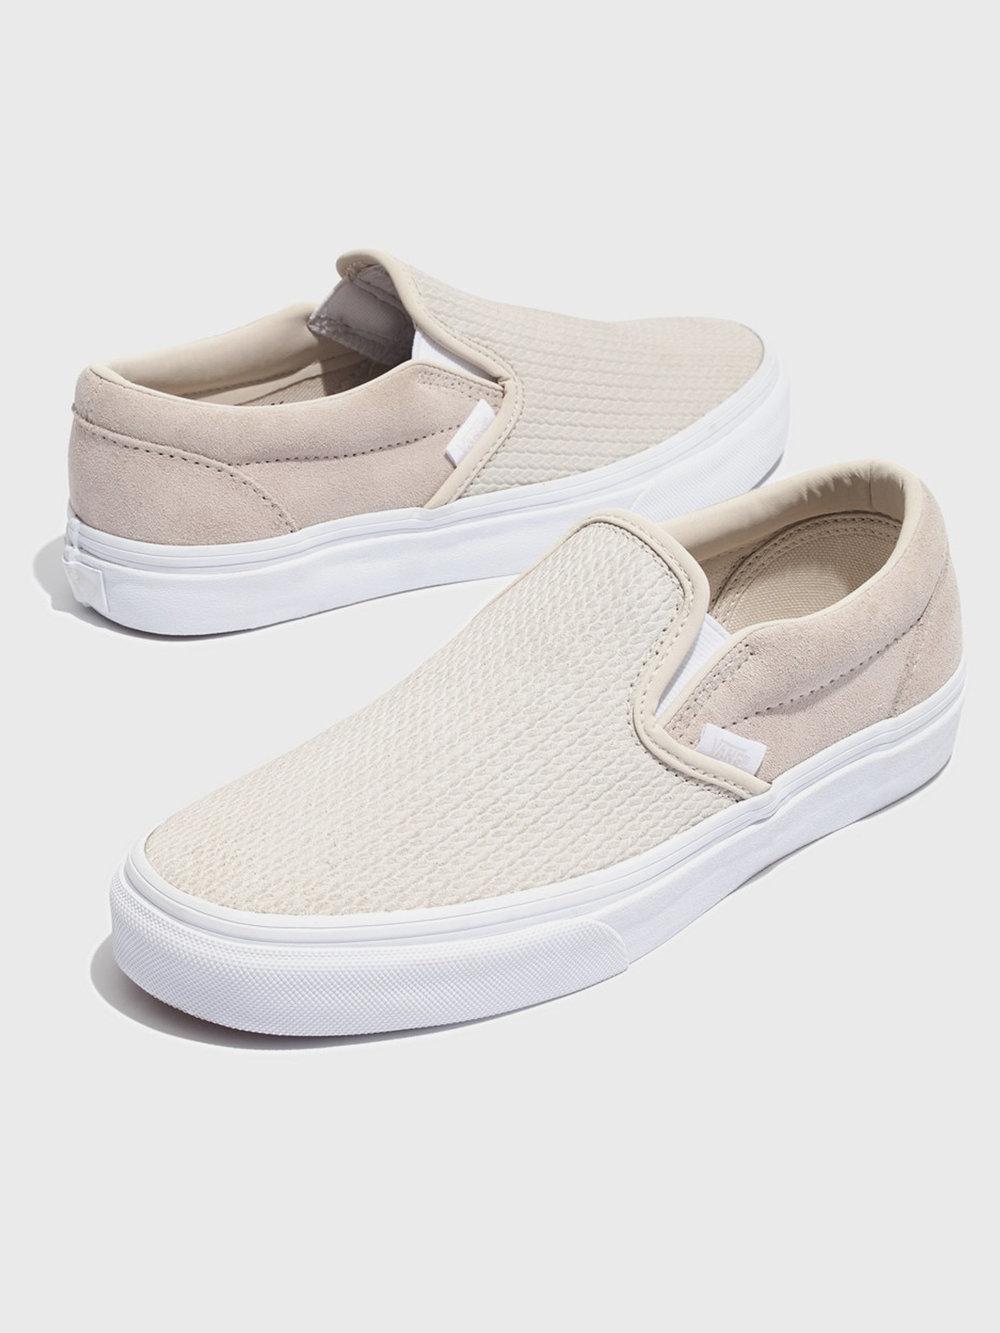 Vans® Unisex Classic Slip-On Sneakers in Moonbeam Suede, $60